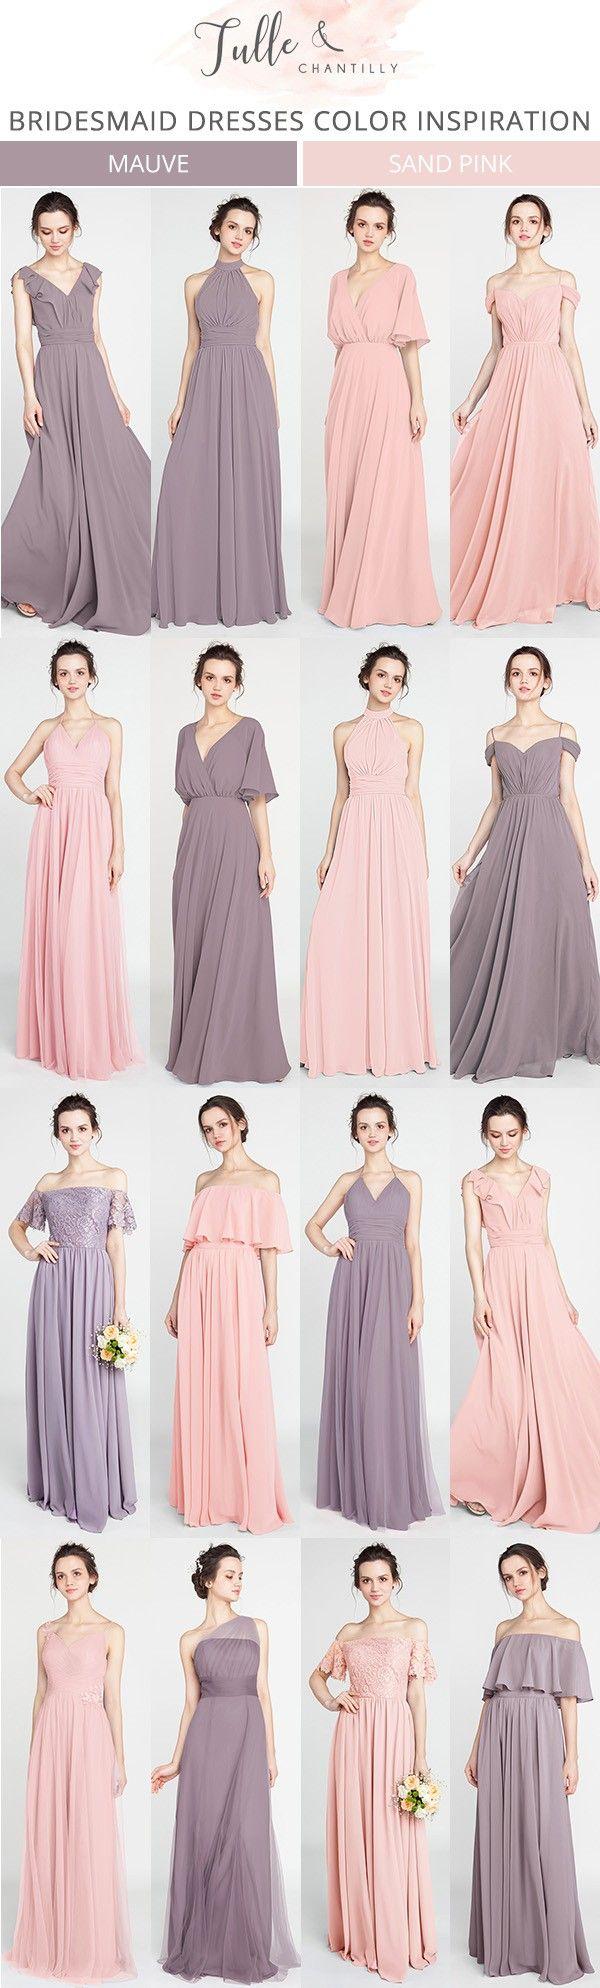 mauve and sand pink bridesmaid dresses for 2018 #bridesmaiddresses #bridalparty #weddingideas #weddingcolors